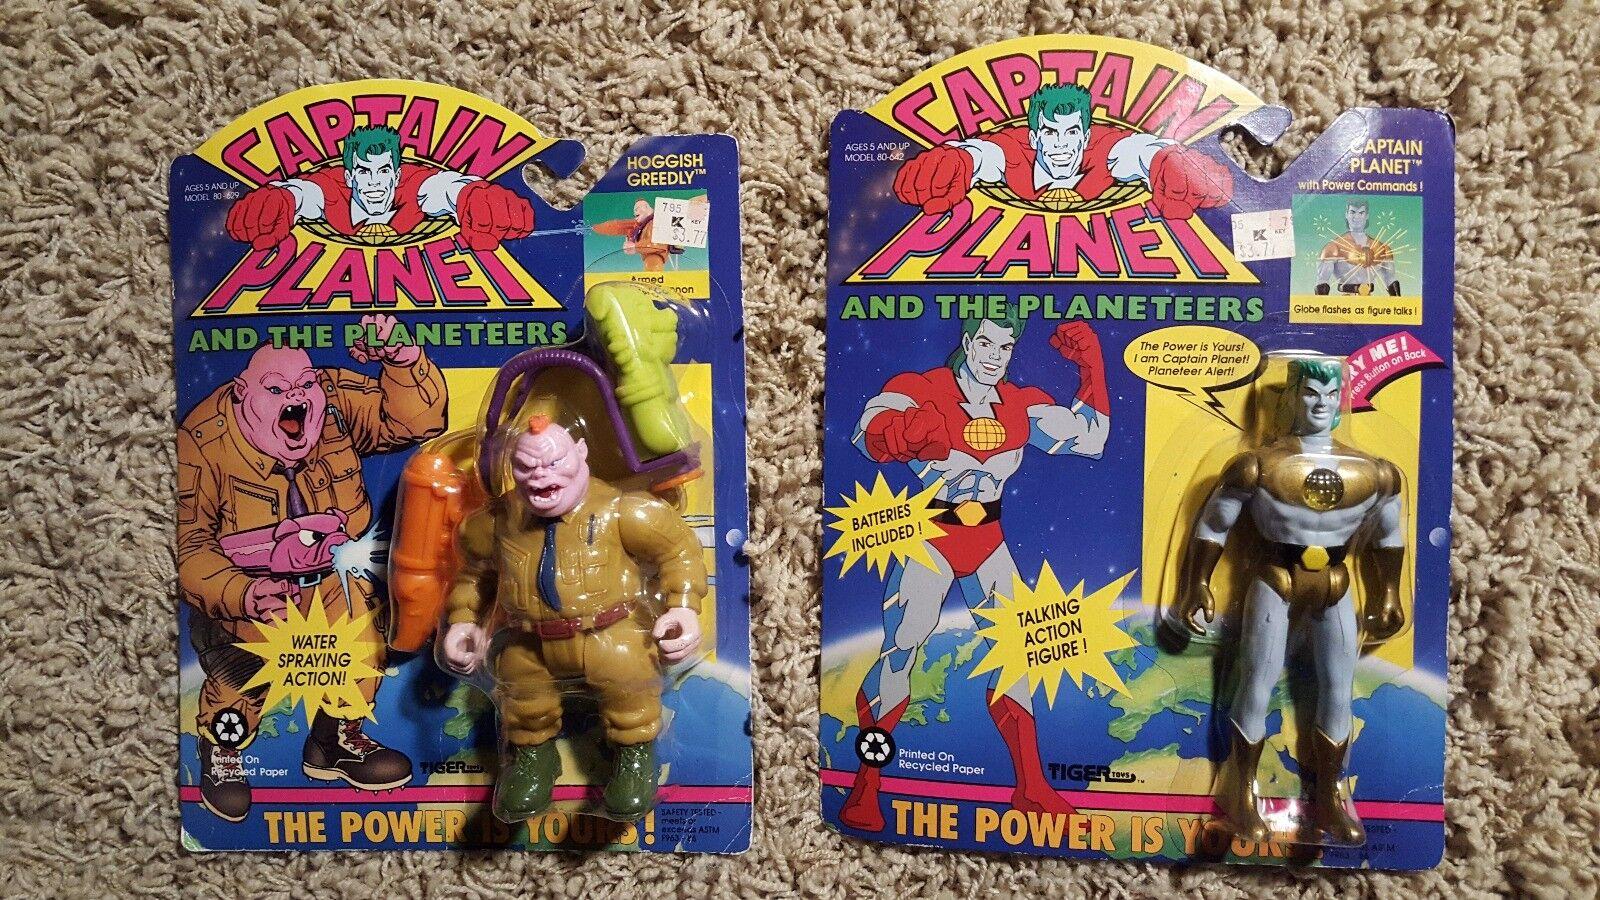 Viele 2 vintage - captain planet actionfiguren moc hoggish greedly neue 1991